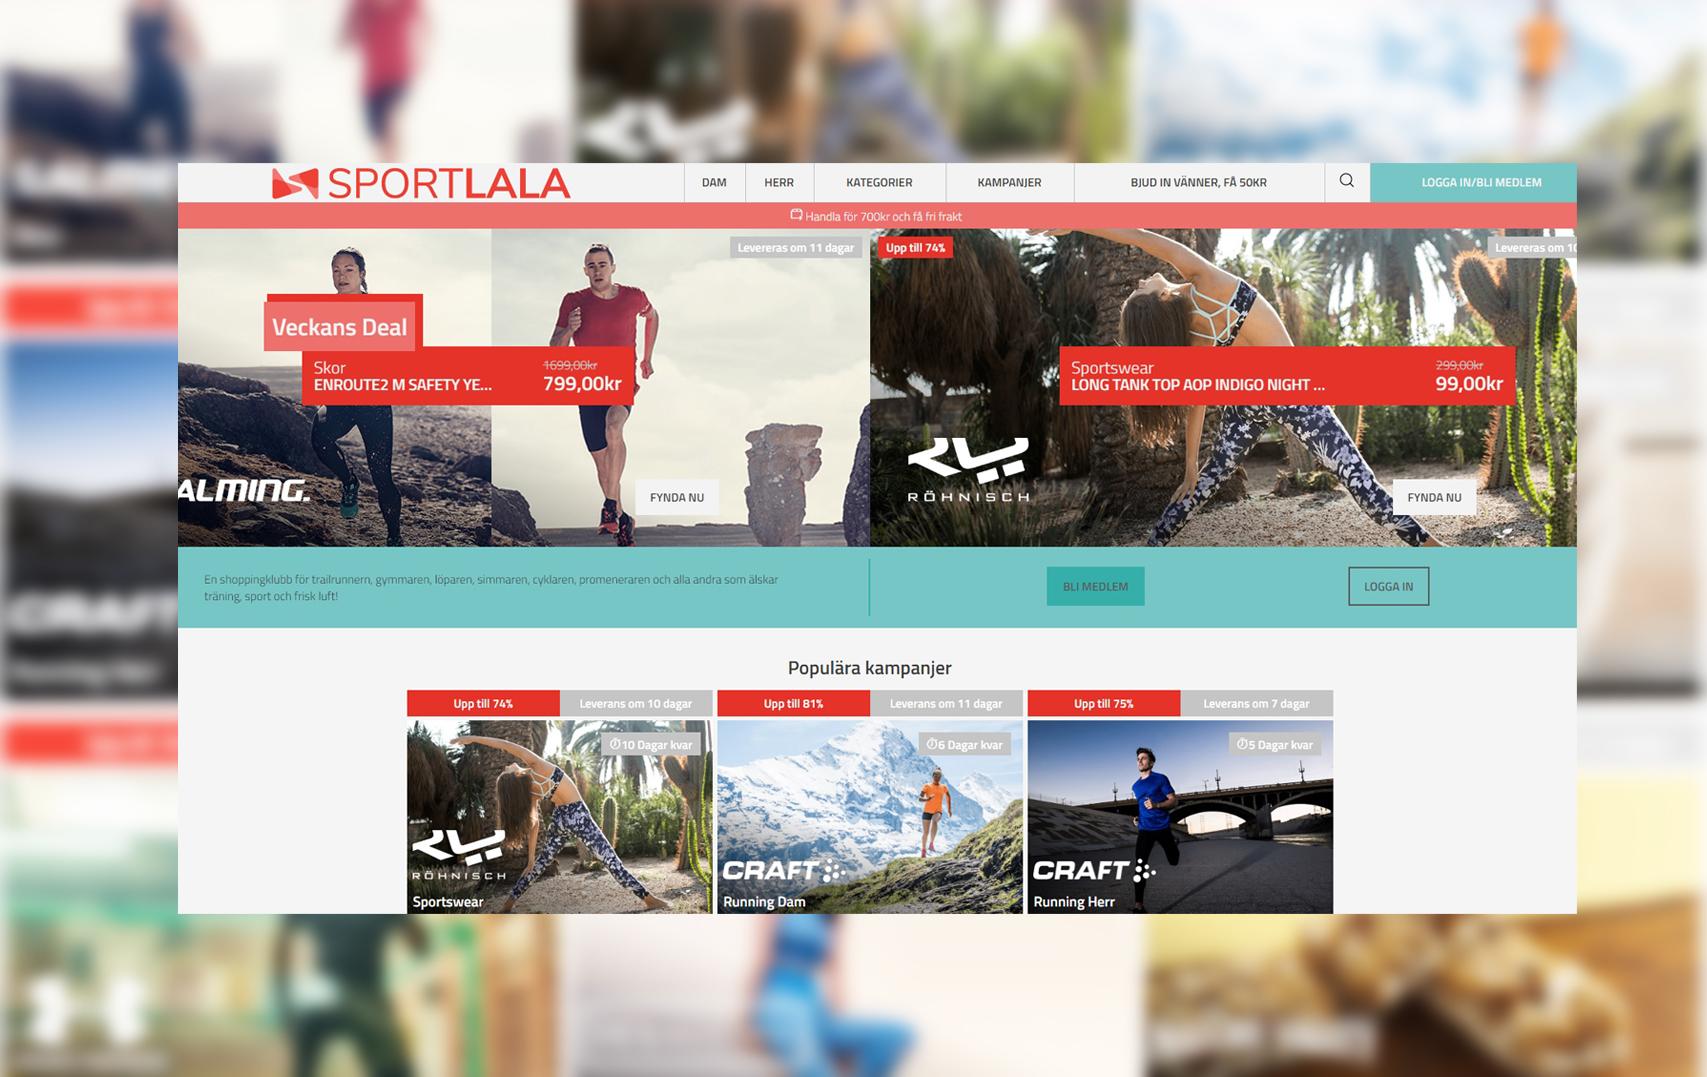 Outletklubben nylanserar sin sajt - igen